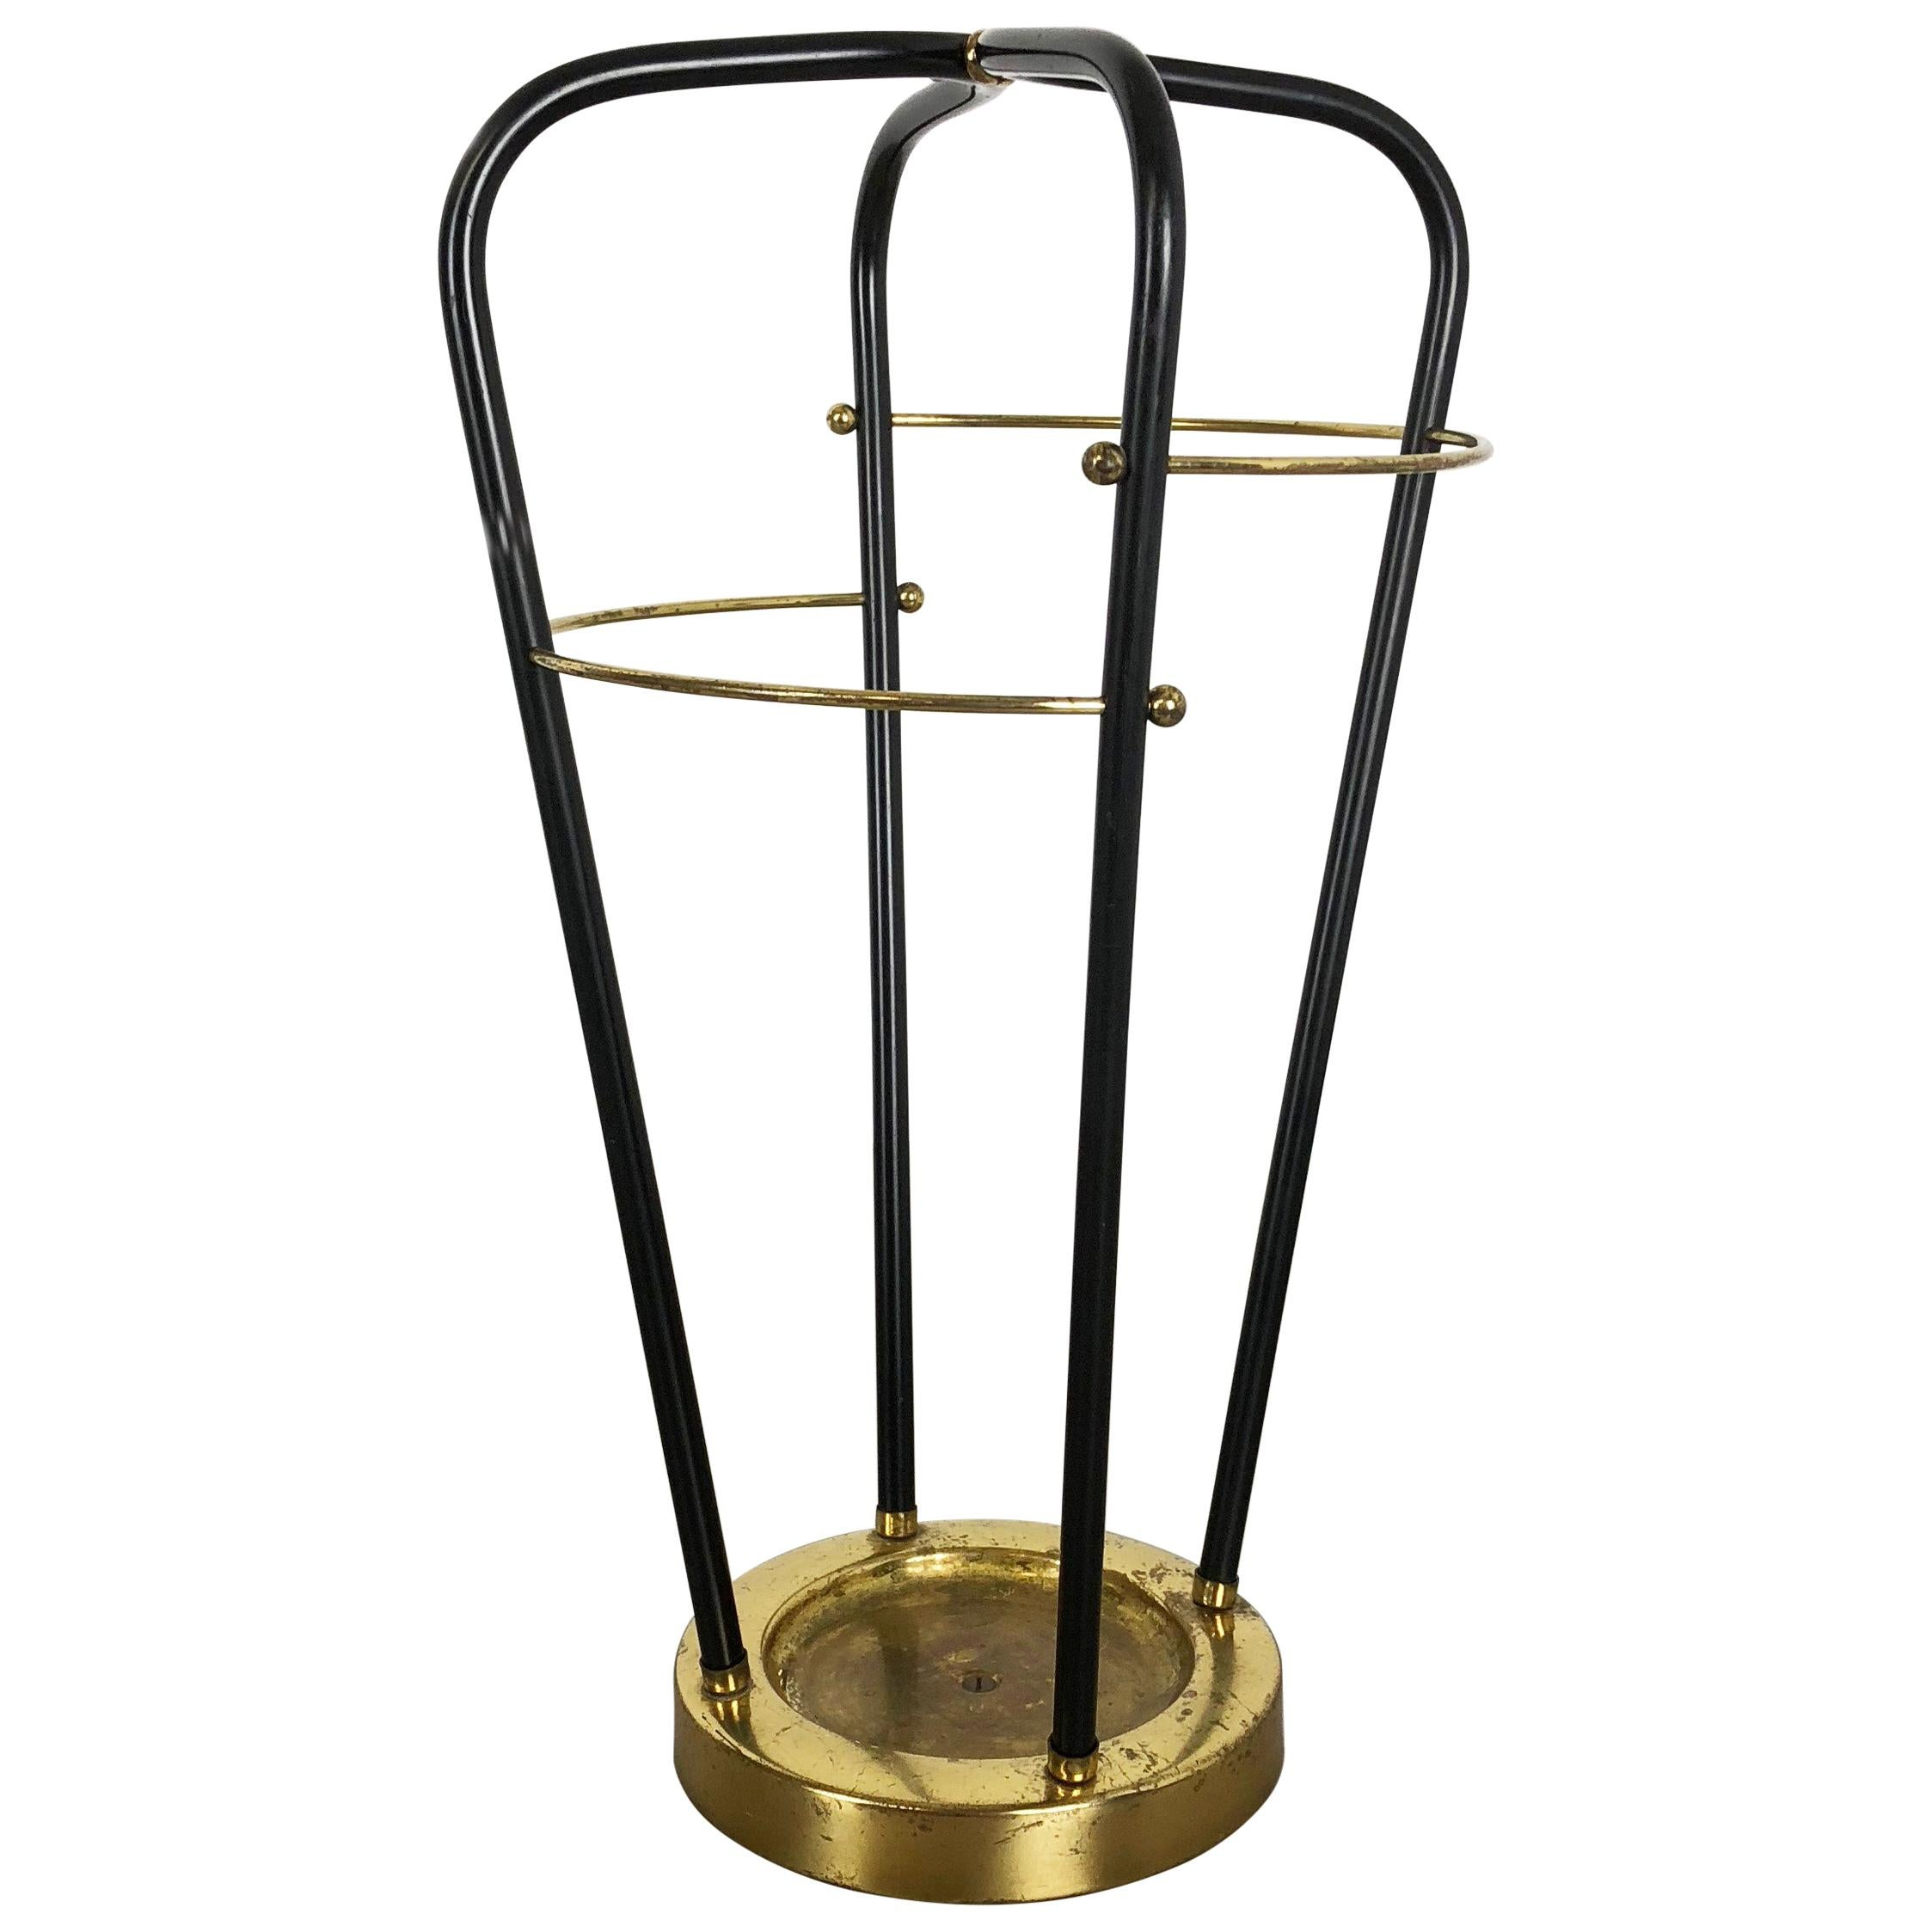 Midcentury Metal Brass Hollywood Regency Umbrella Stand, Germany, 1950s